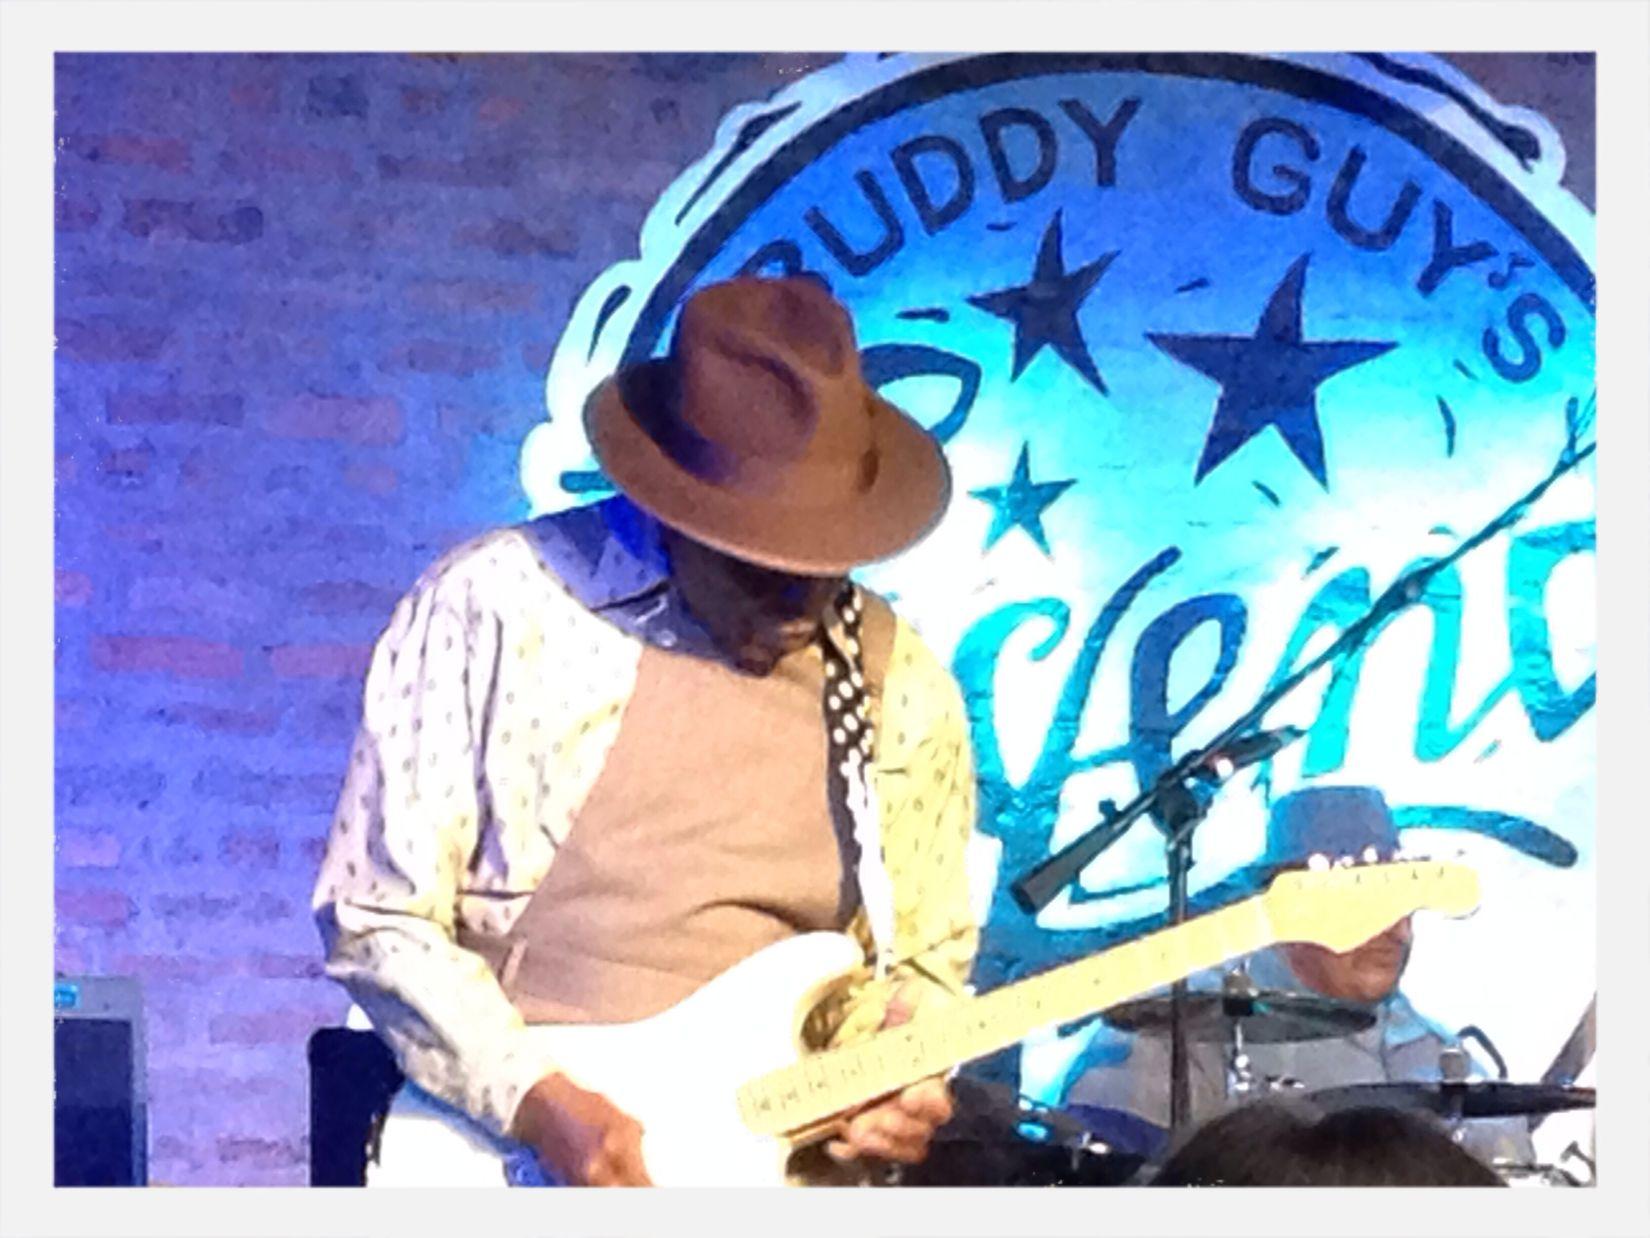 Buddy Guy's Legends Chicago Live Blues Buddy Guy Blues The Blues Bluesn' Chicago Blues Bar Legend Talent